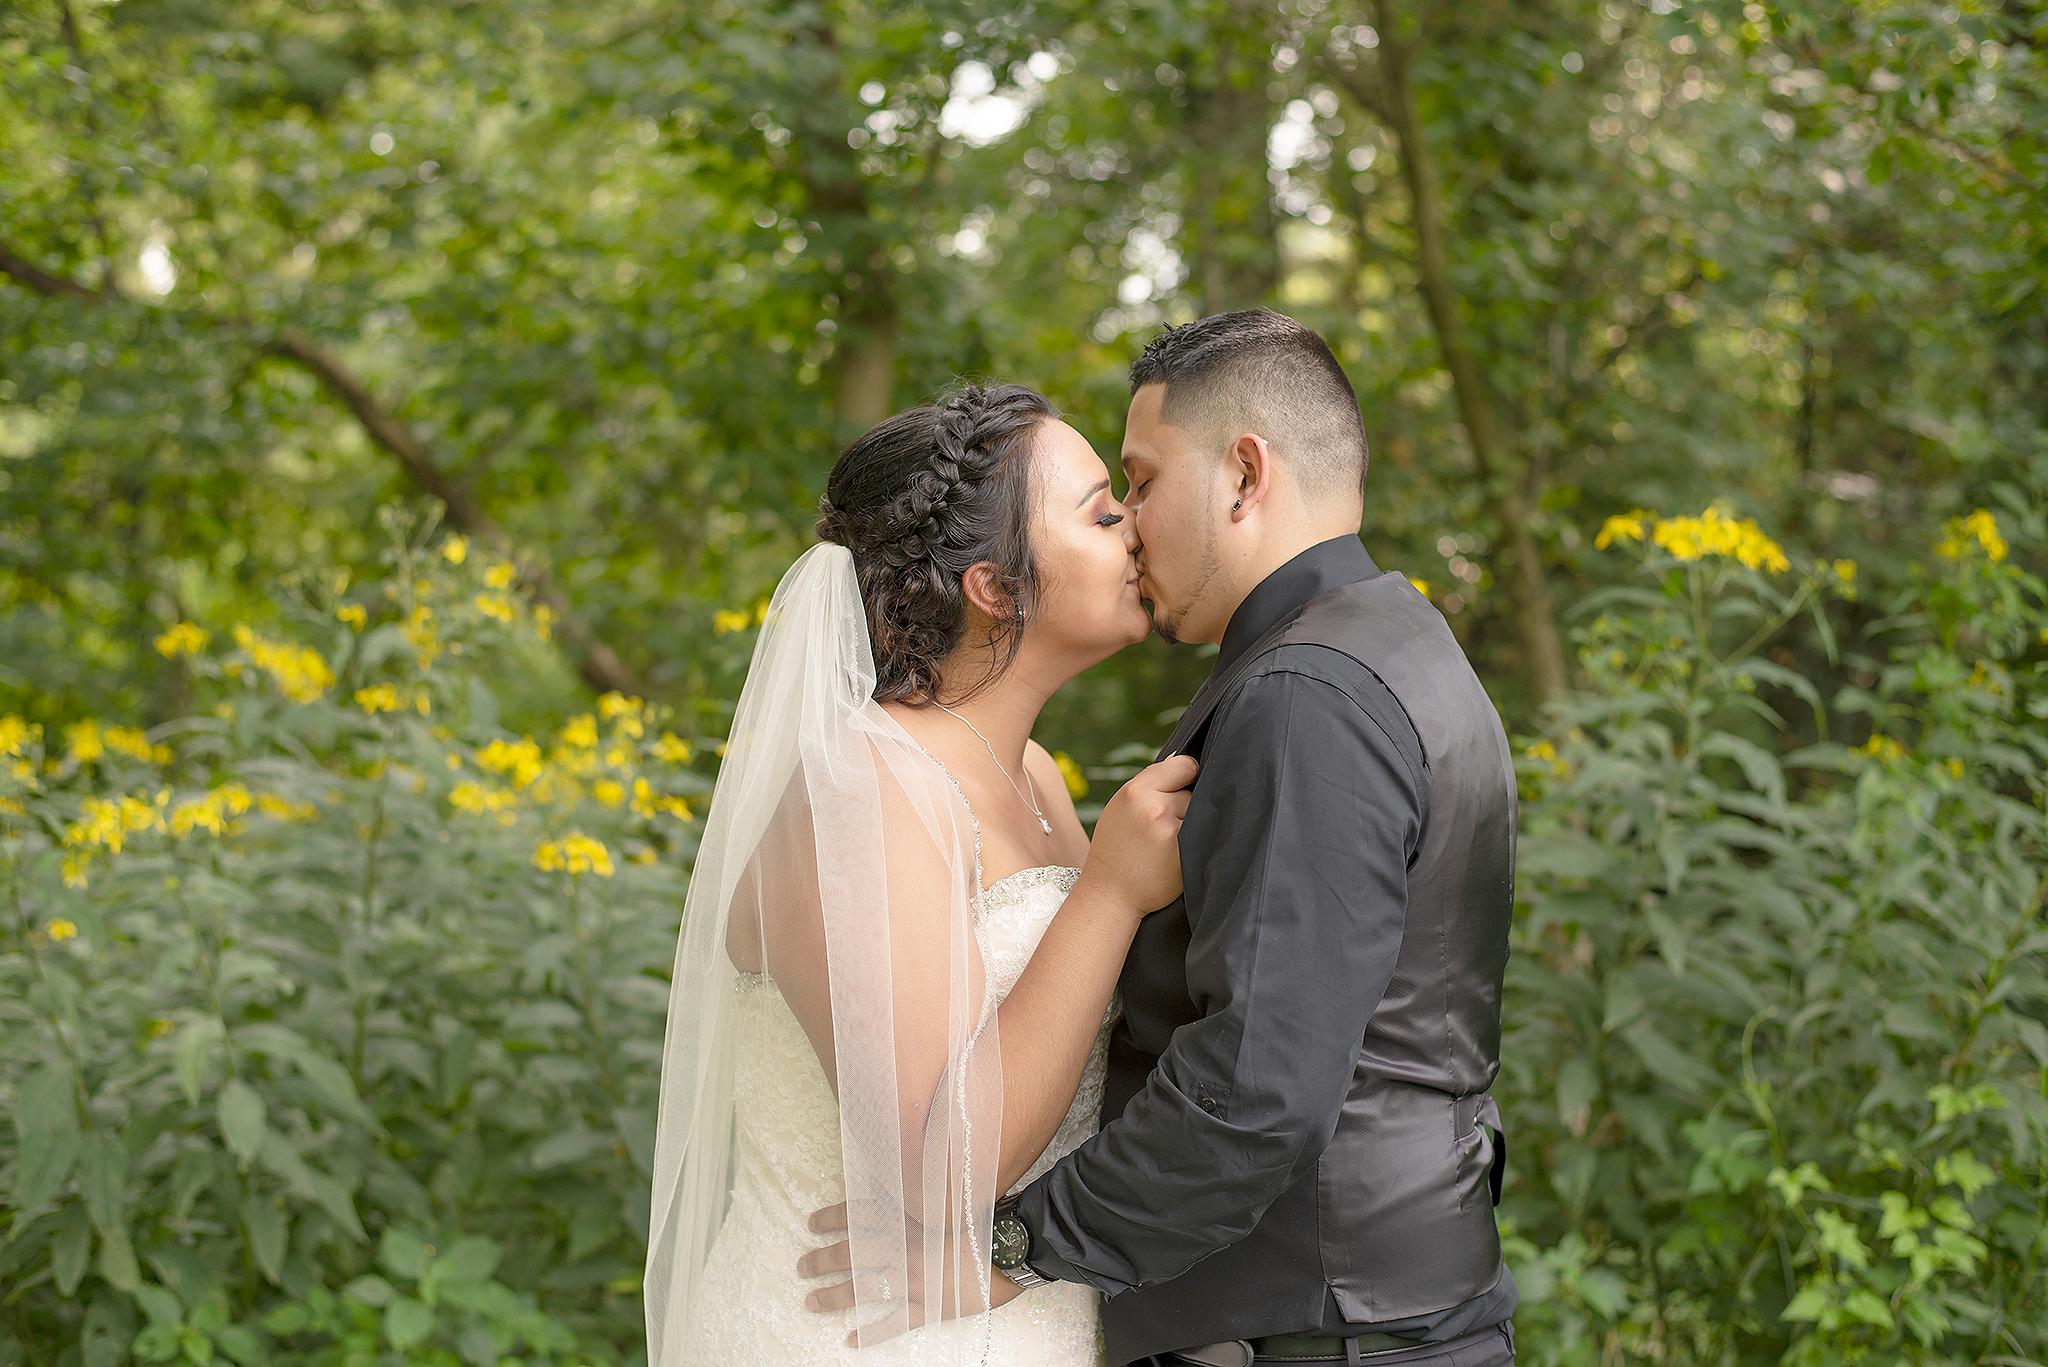 Lindsay-Adkins-Photography-Michigan-Wedding-Photographer-BernalBlog-16